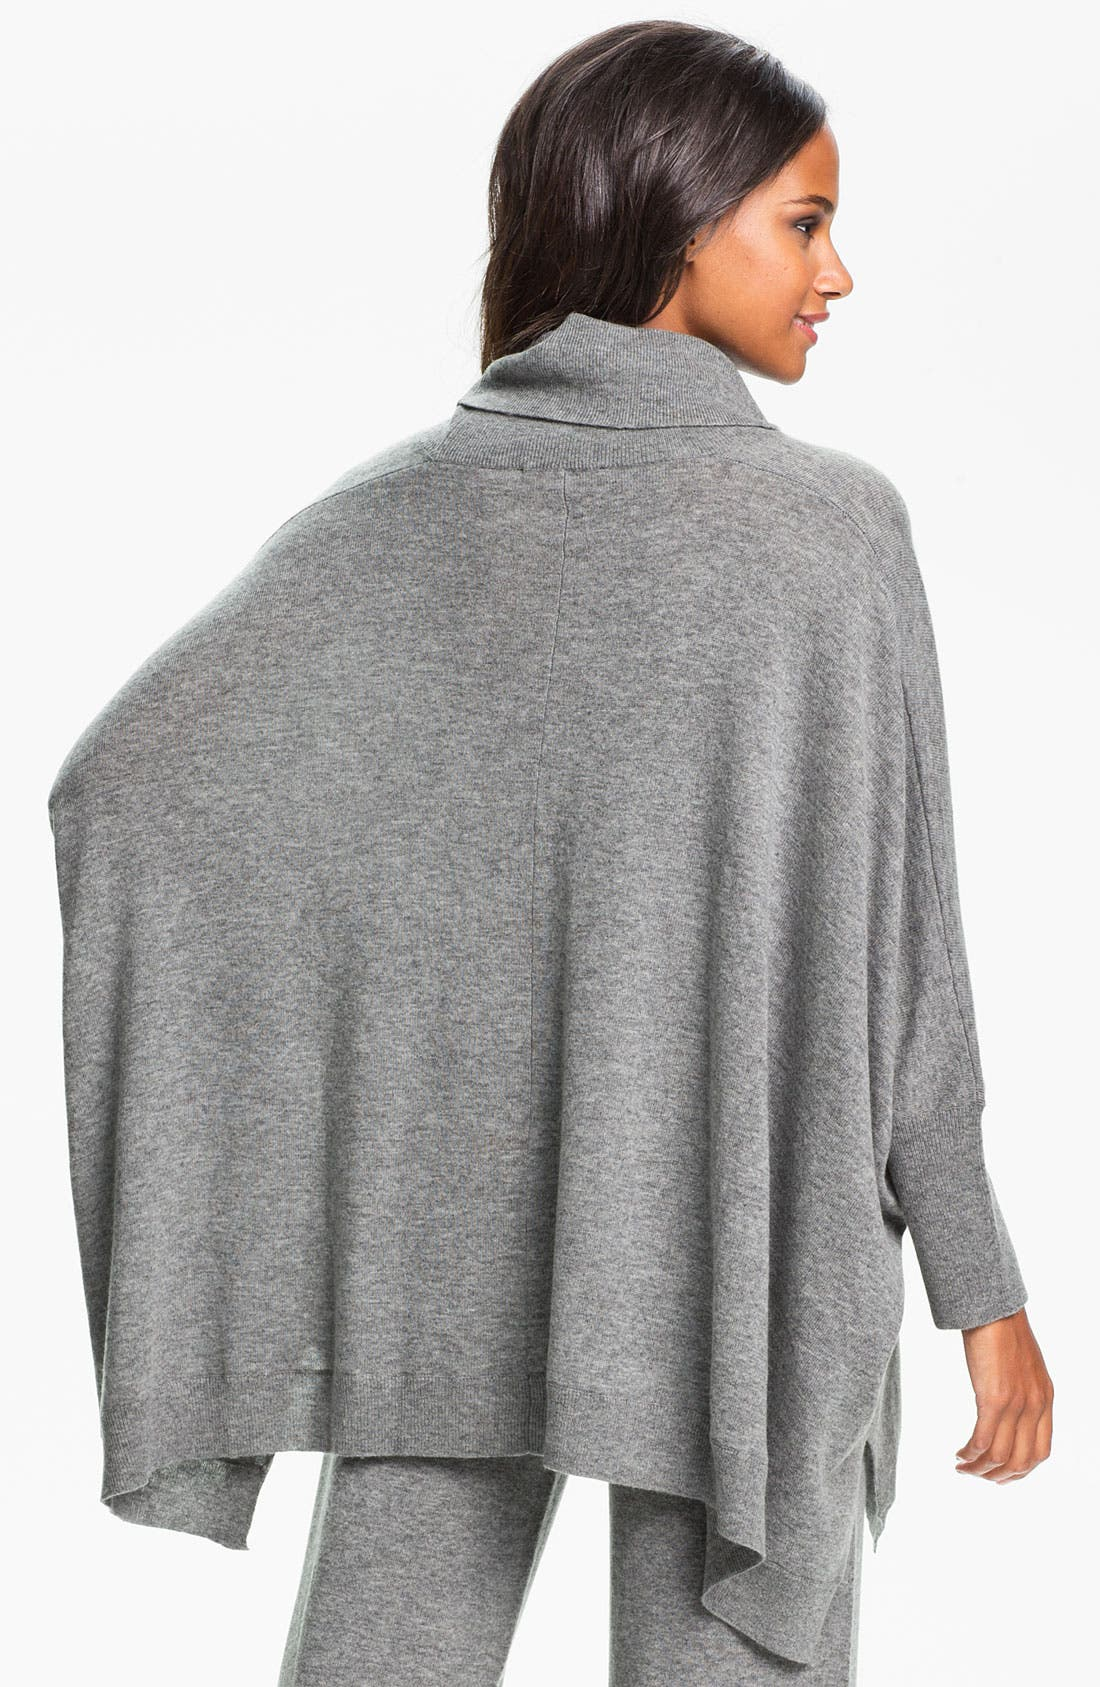 Alternate Image 2  - Donna Karan 'Cozy' Sweater Knit Poncho